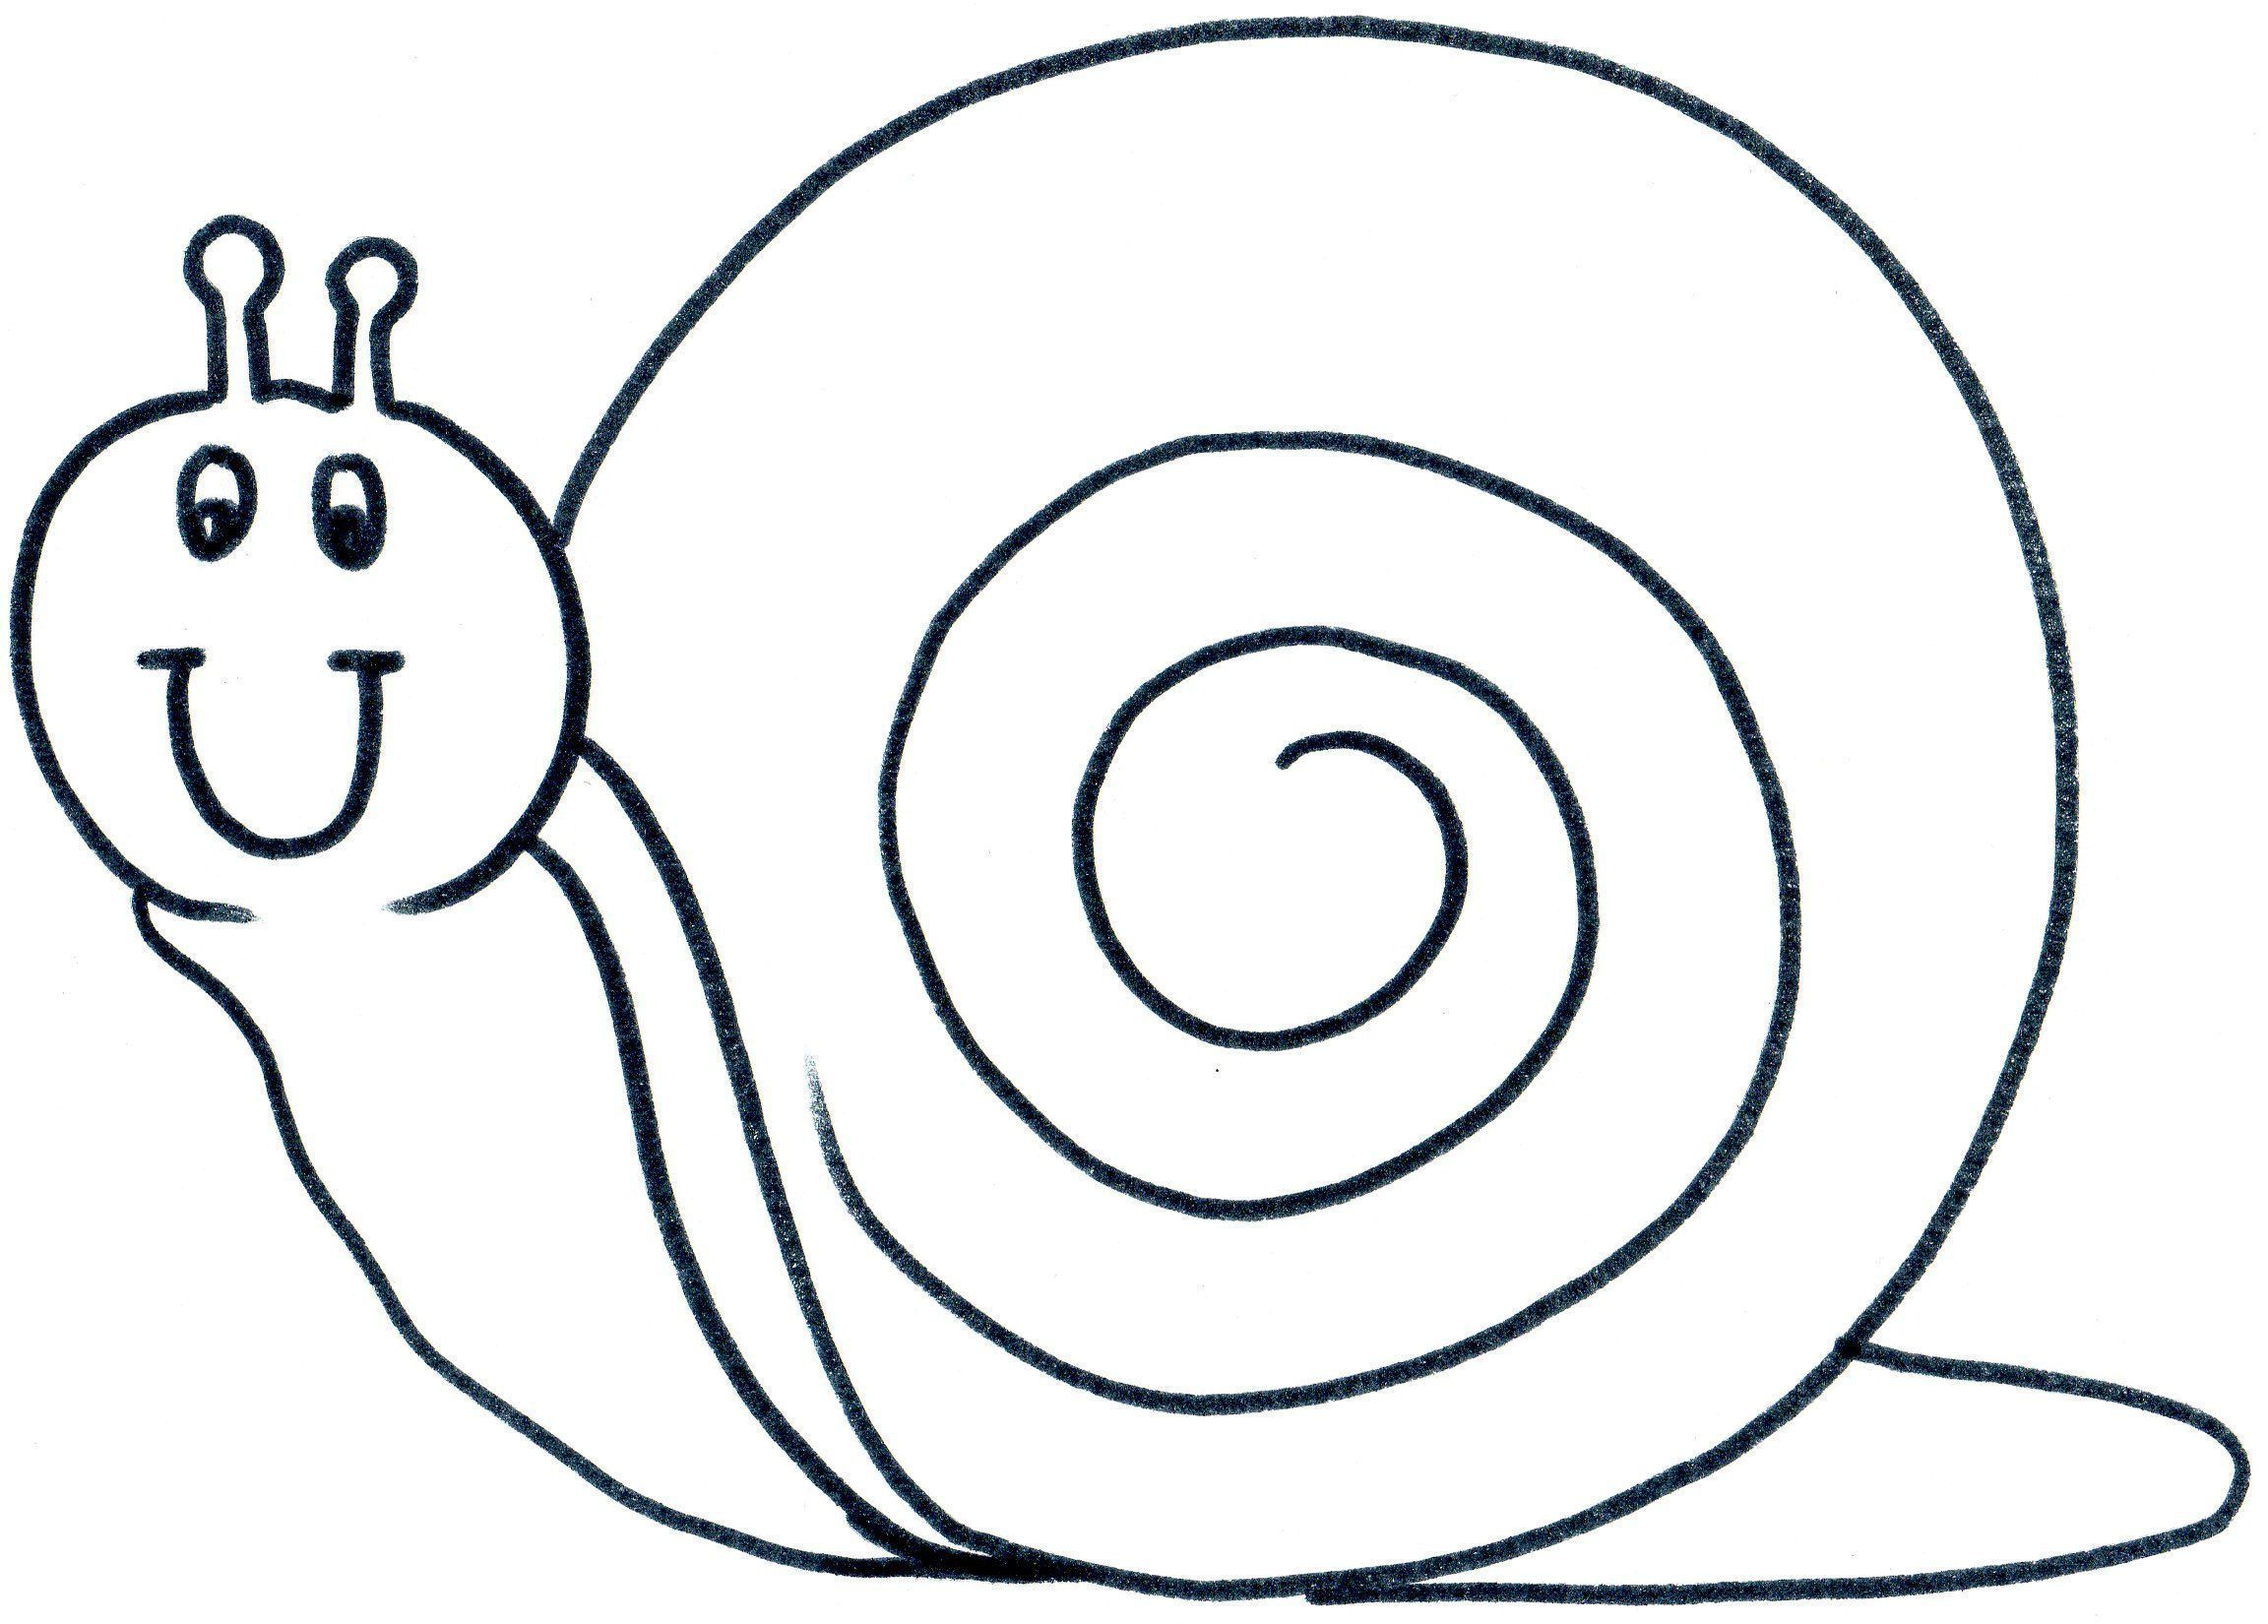 Inspirant Escargot Image Coloriage